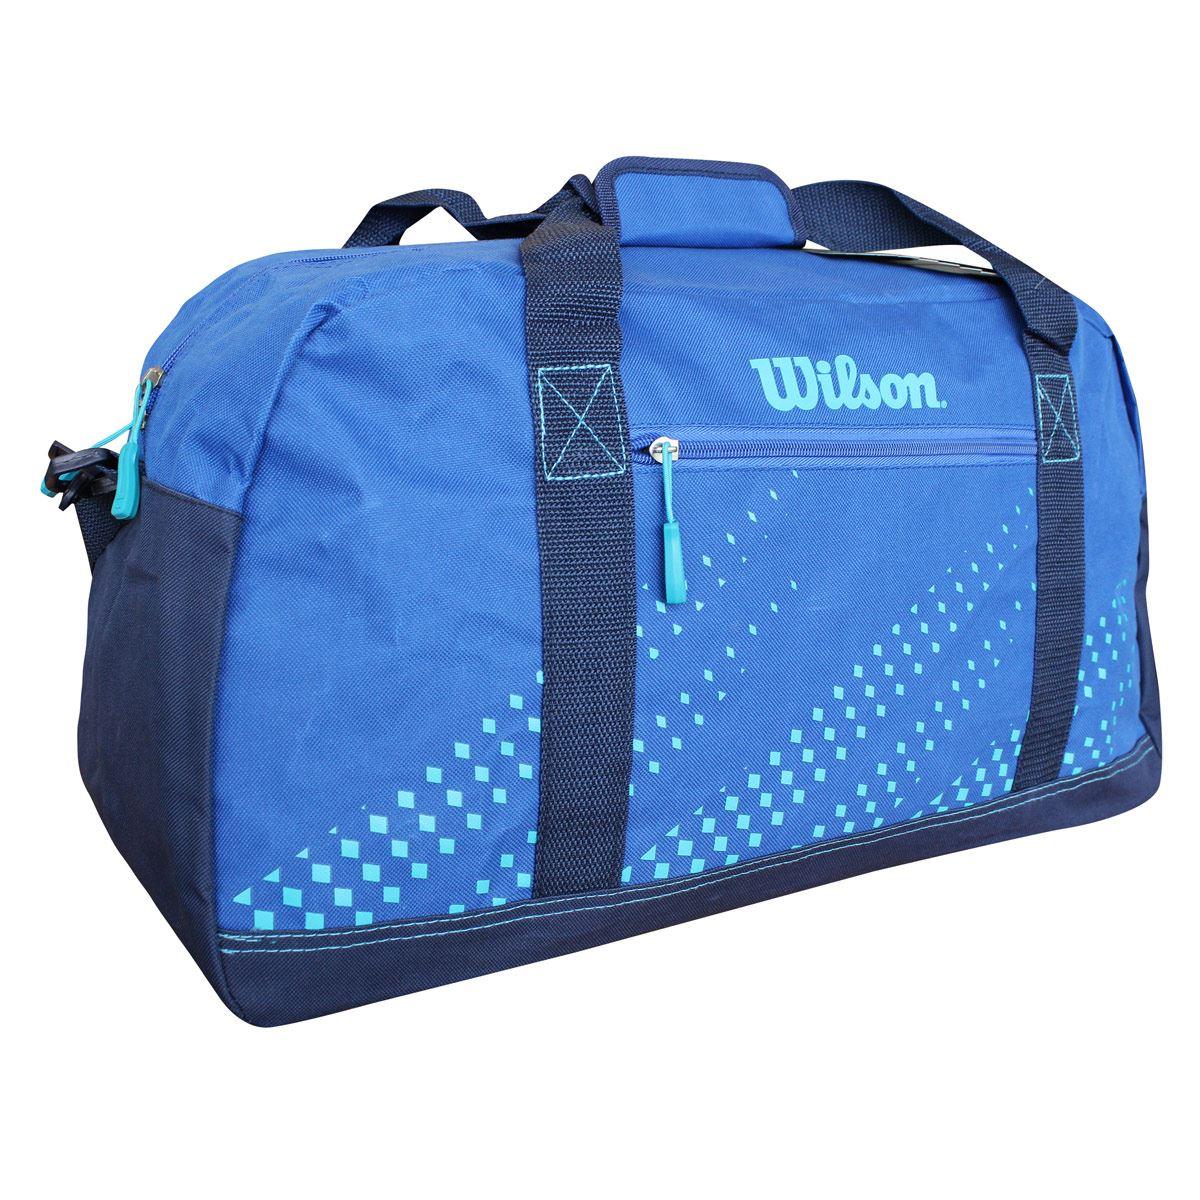 Maleta Deportiva Wilson Is-15356 Azul